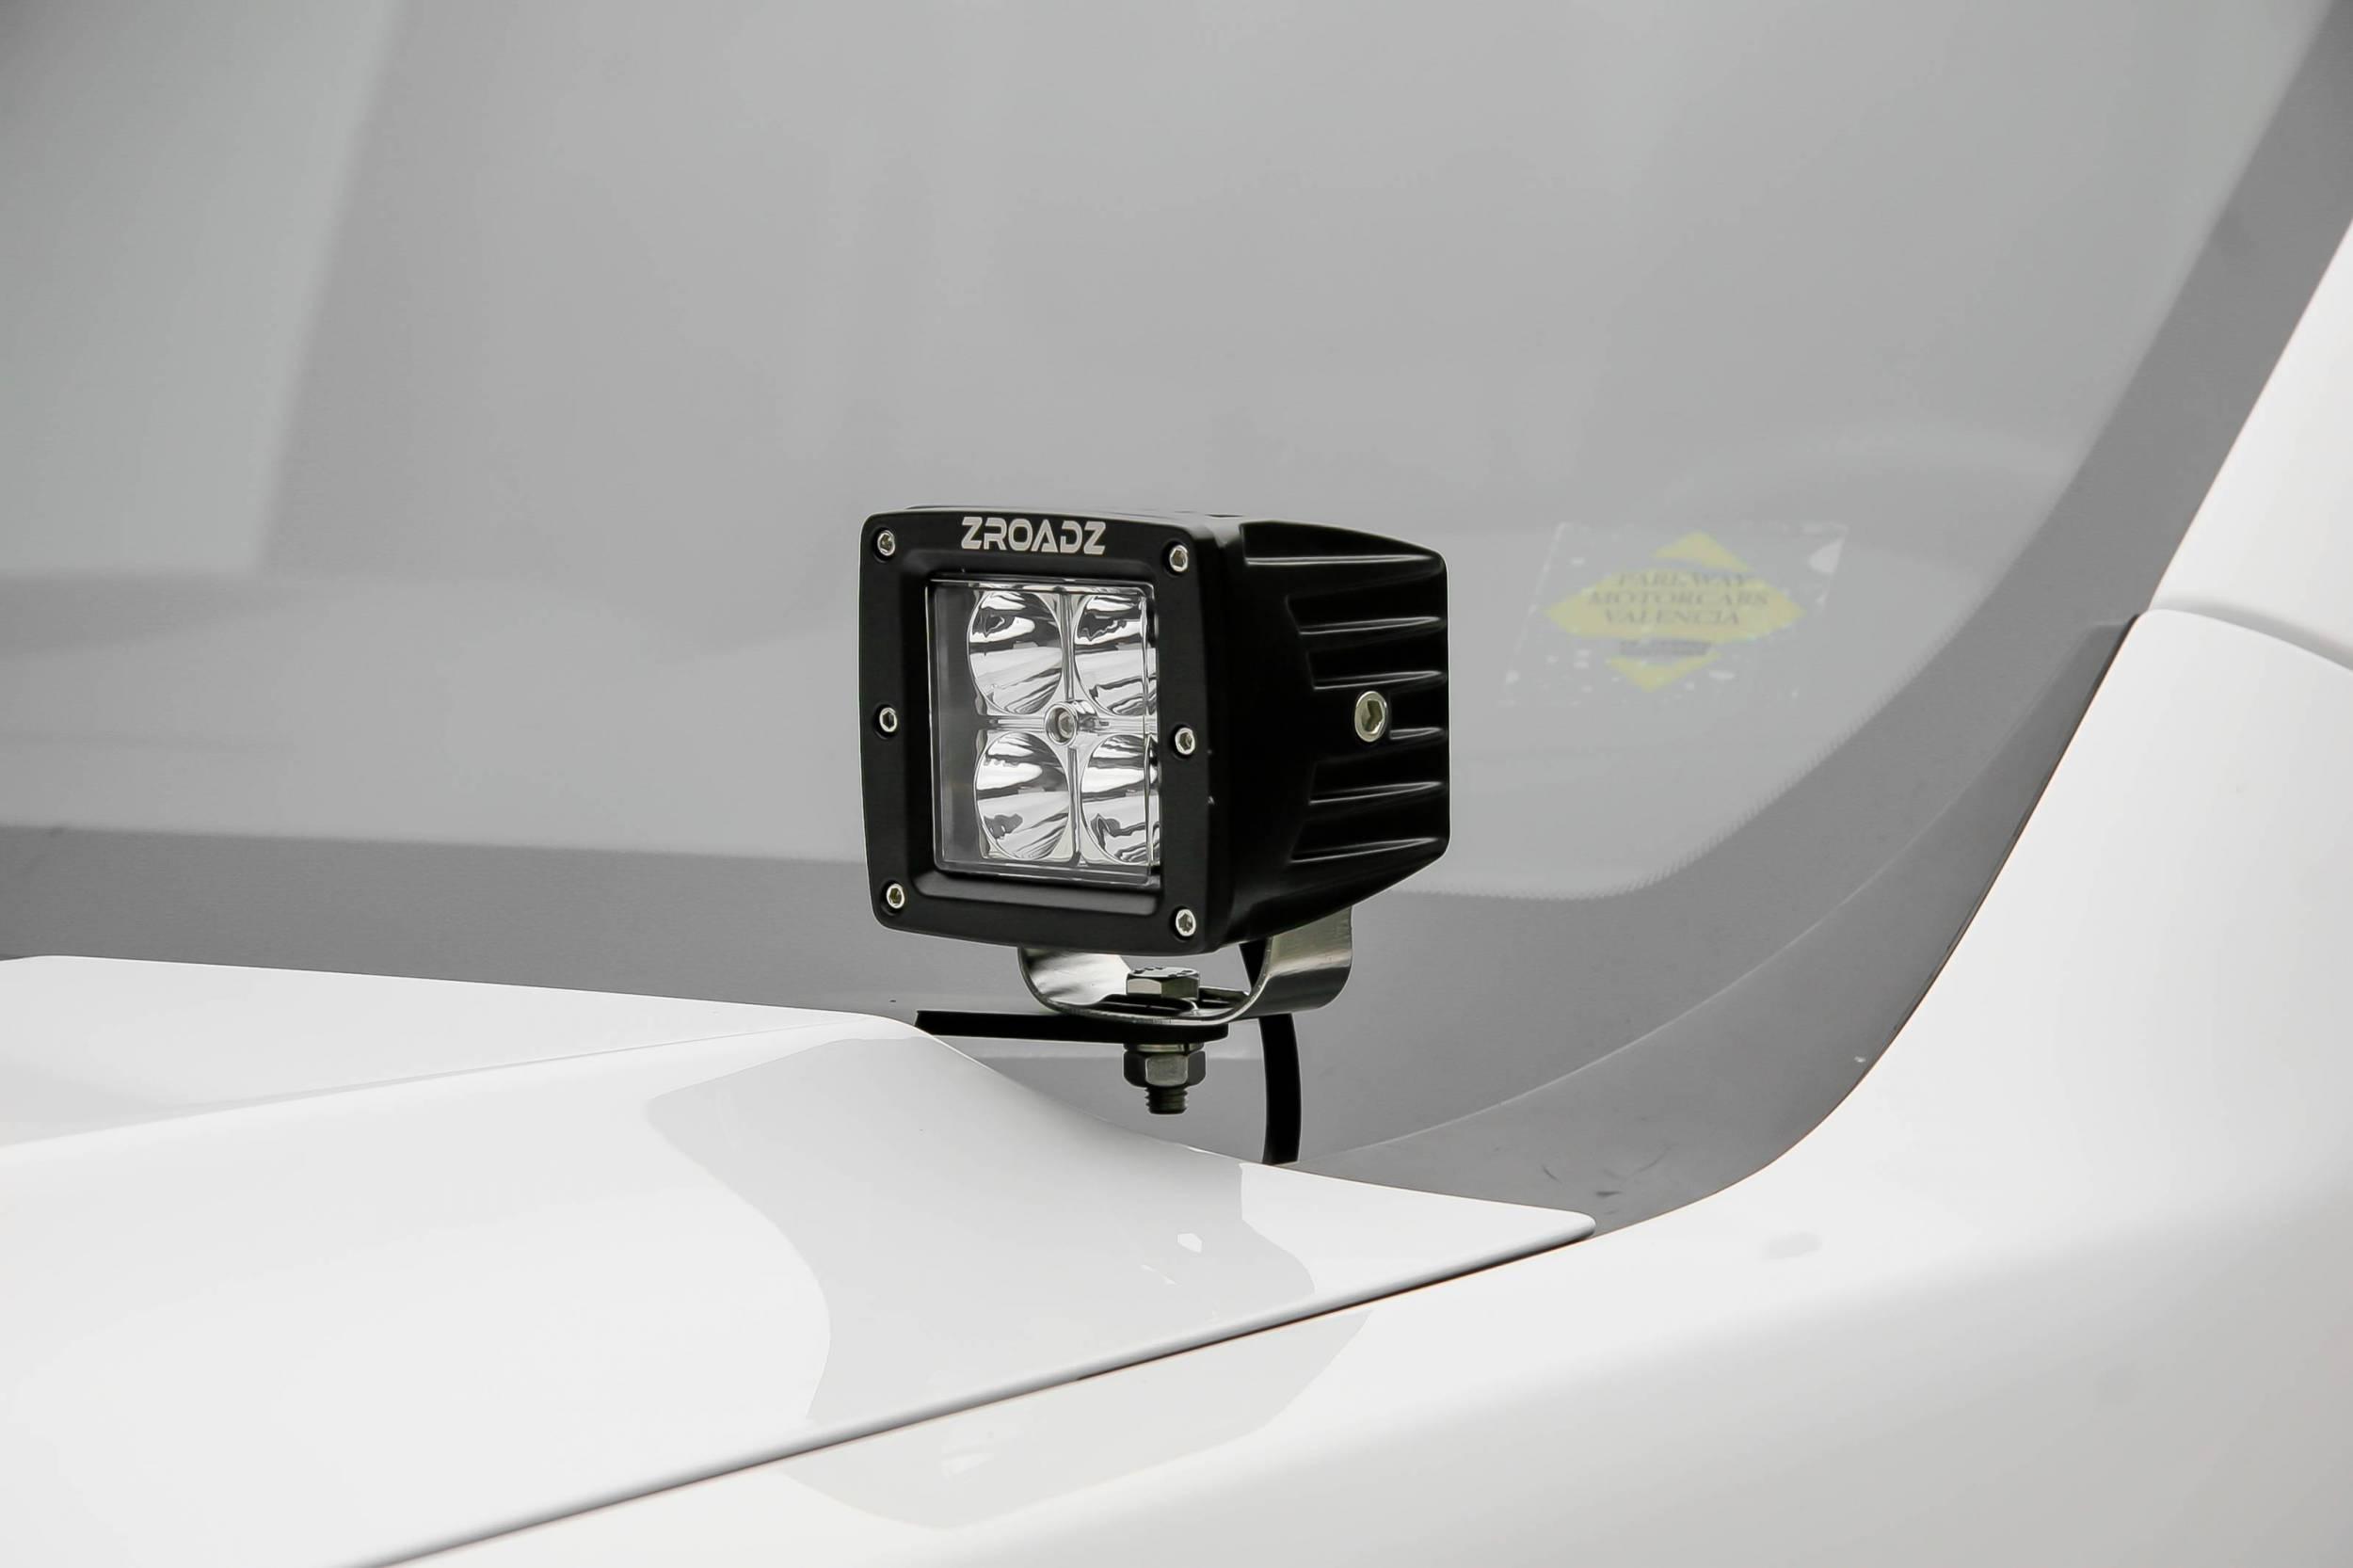 2019-2020 GMC Sierra 1500 Hood Hinge Bracket - PN# Z362281